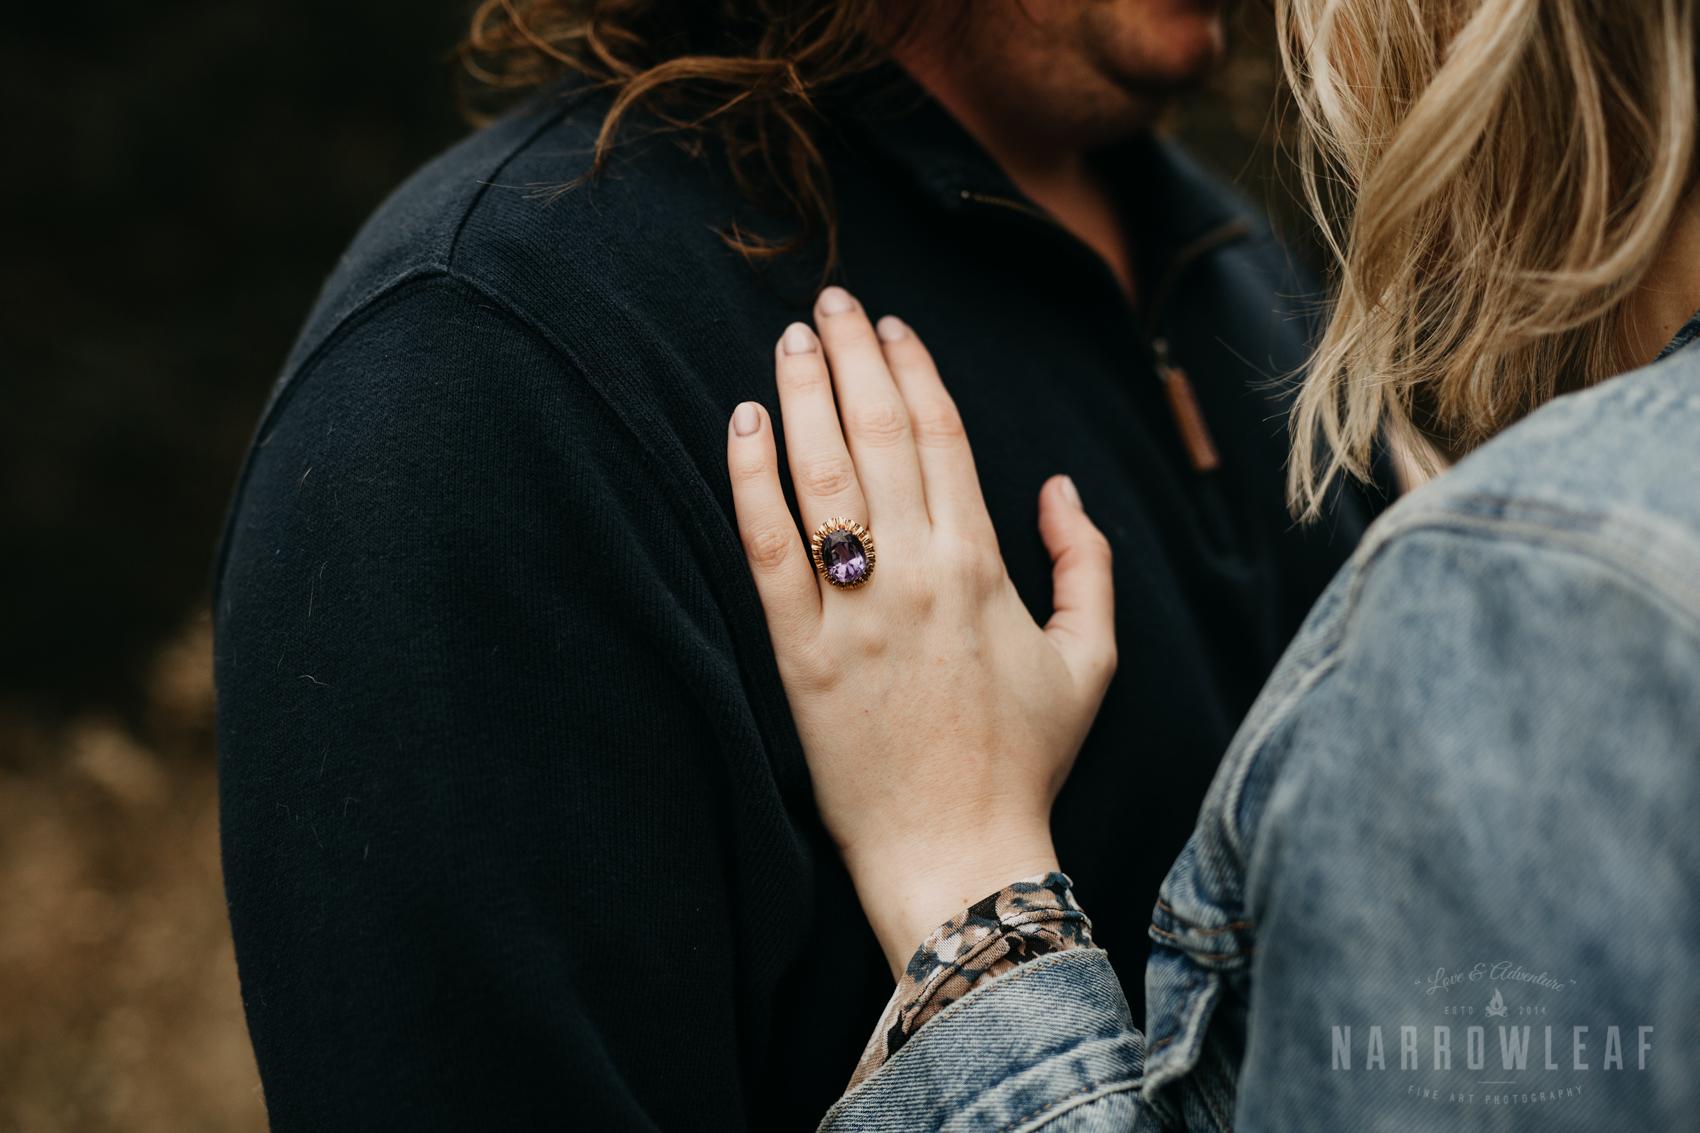 fall-engagement-couple-photos-prescott-wi-narrowleaf-photography-16.jpg